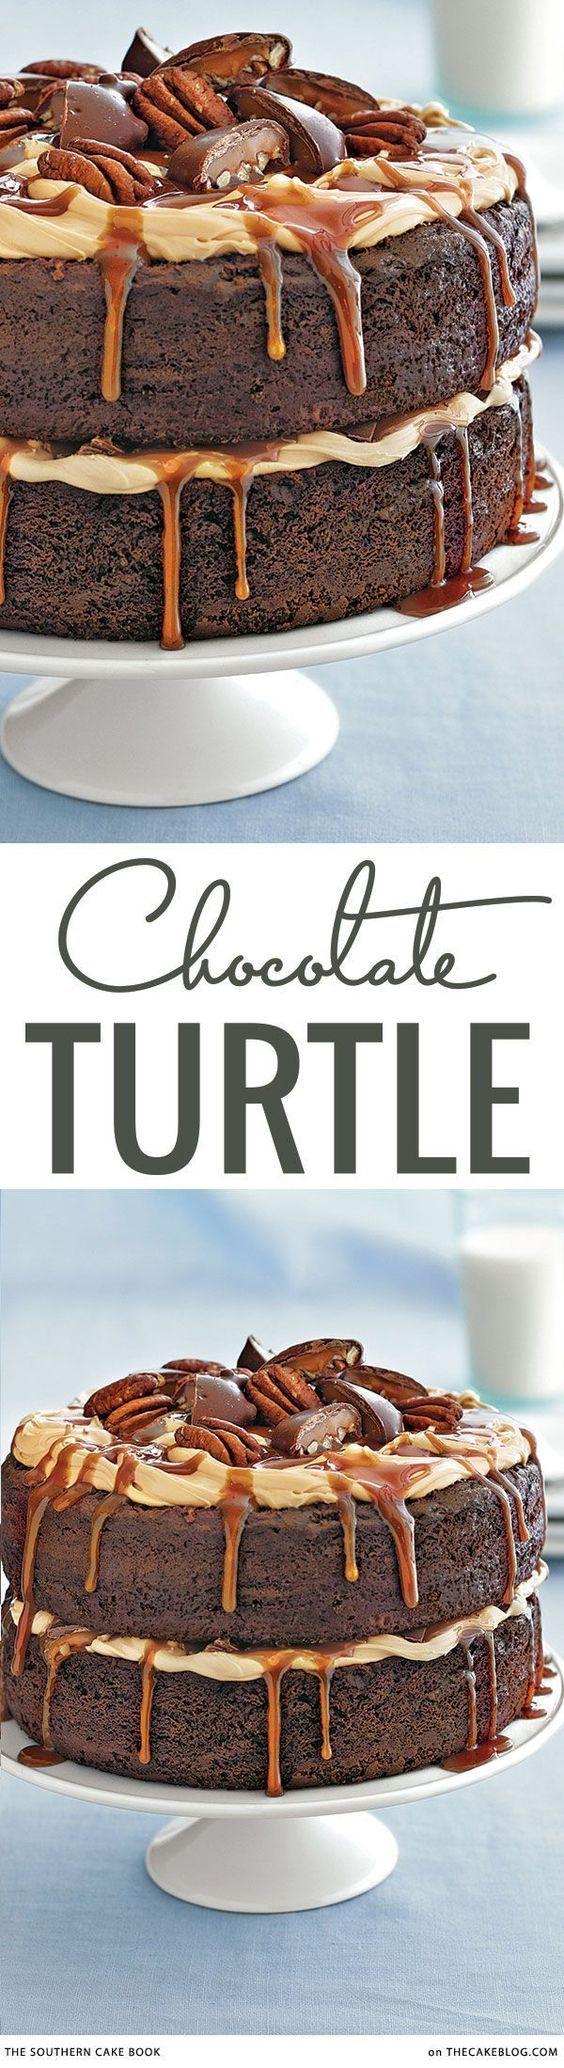 Chocolate, caramel and pecan heaven! Chocolate Turtle Cake Recipe   The Southern Cake Book on TheCakeBlog.com